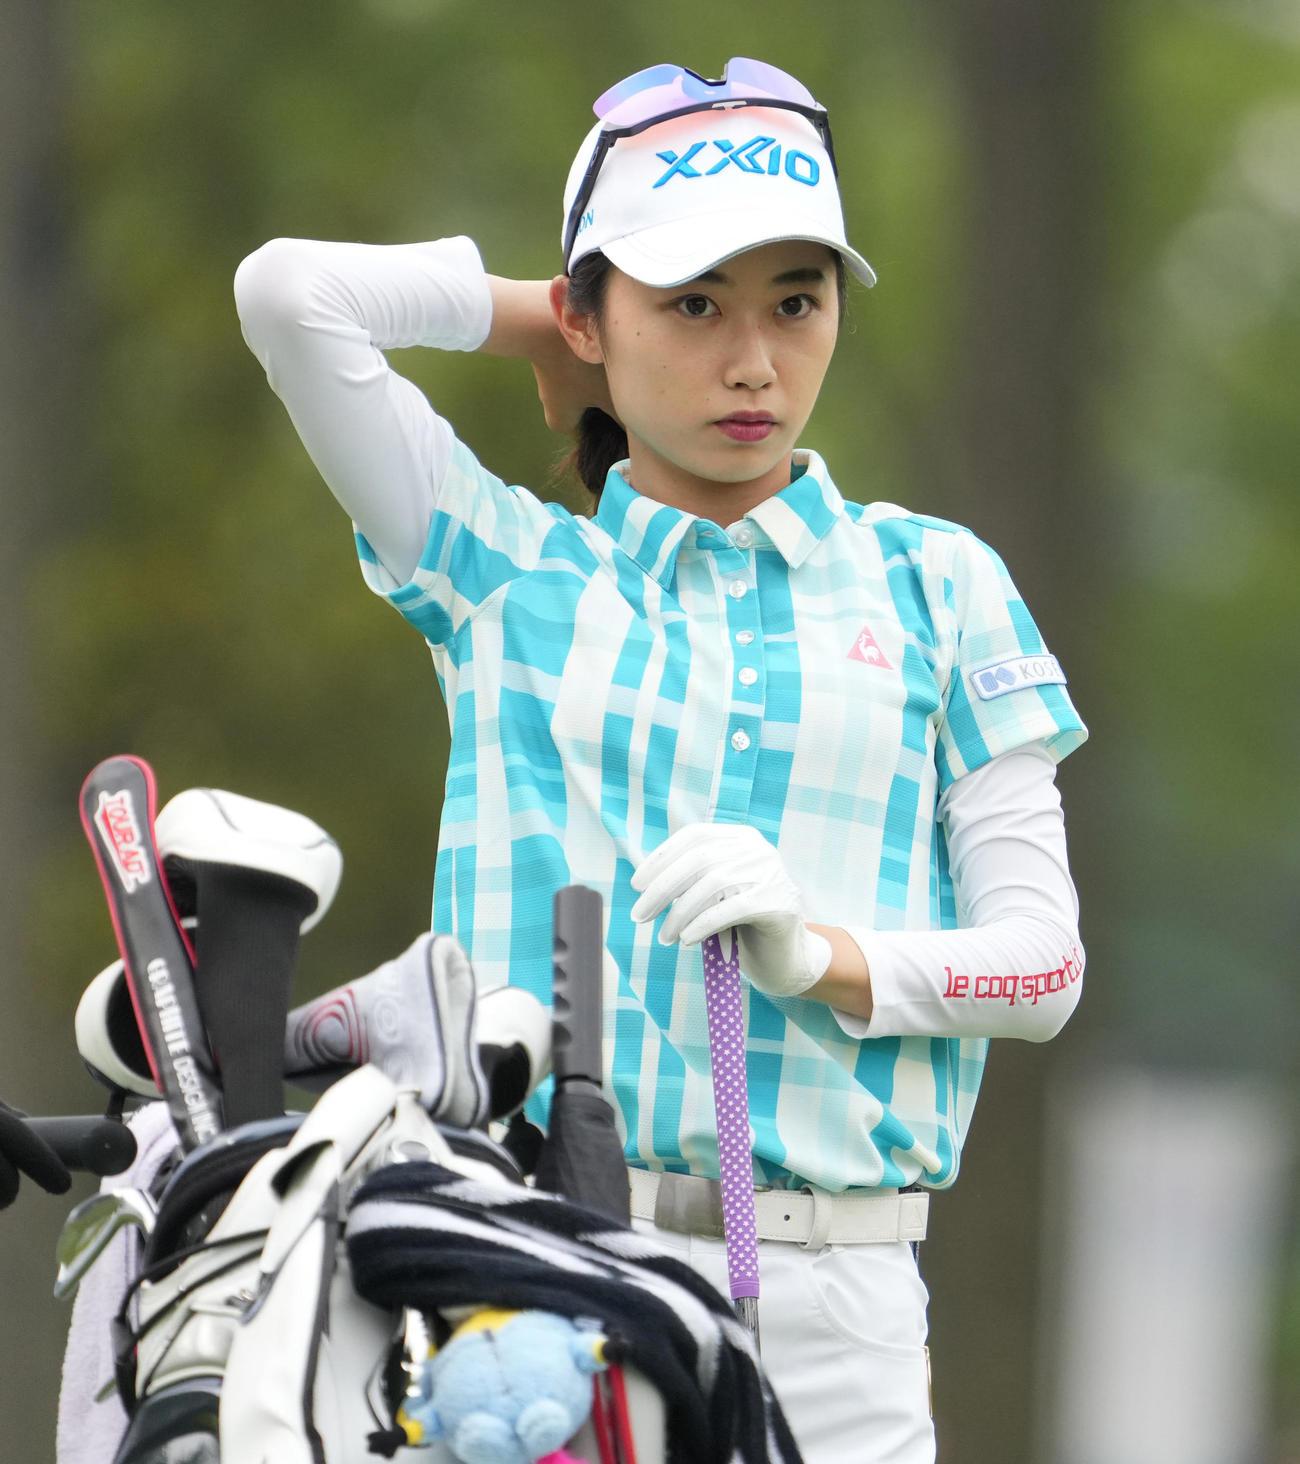 https://www.nikkansports.com/sports/golf/news/img/202106110000044-w1300_3.jpg